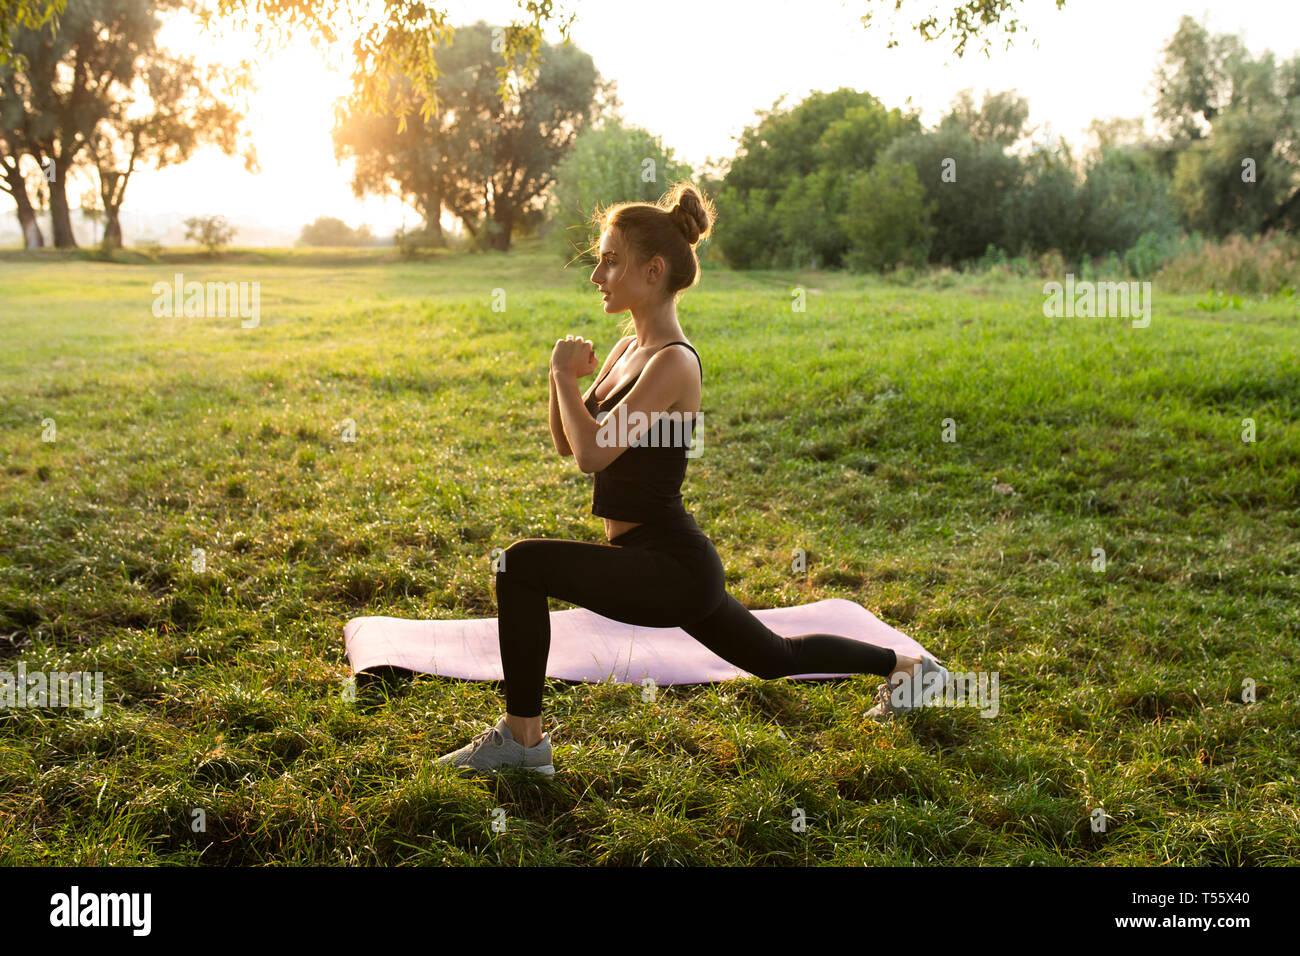 Junge Frau praktizieren Yoga im park Stockfoto